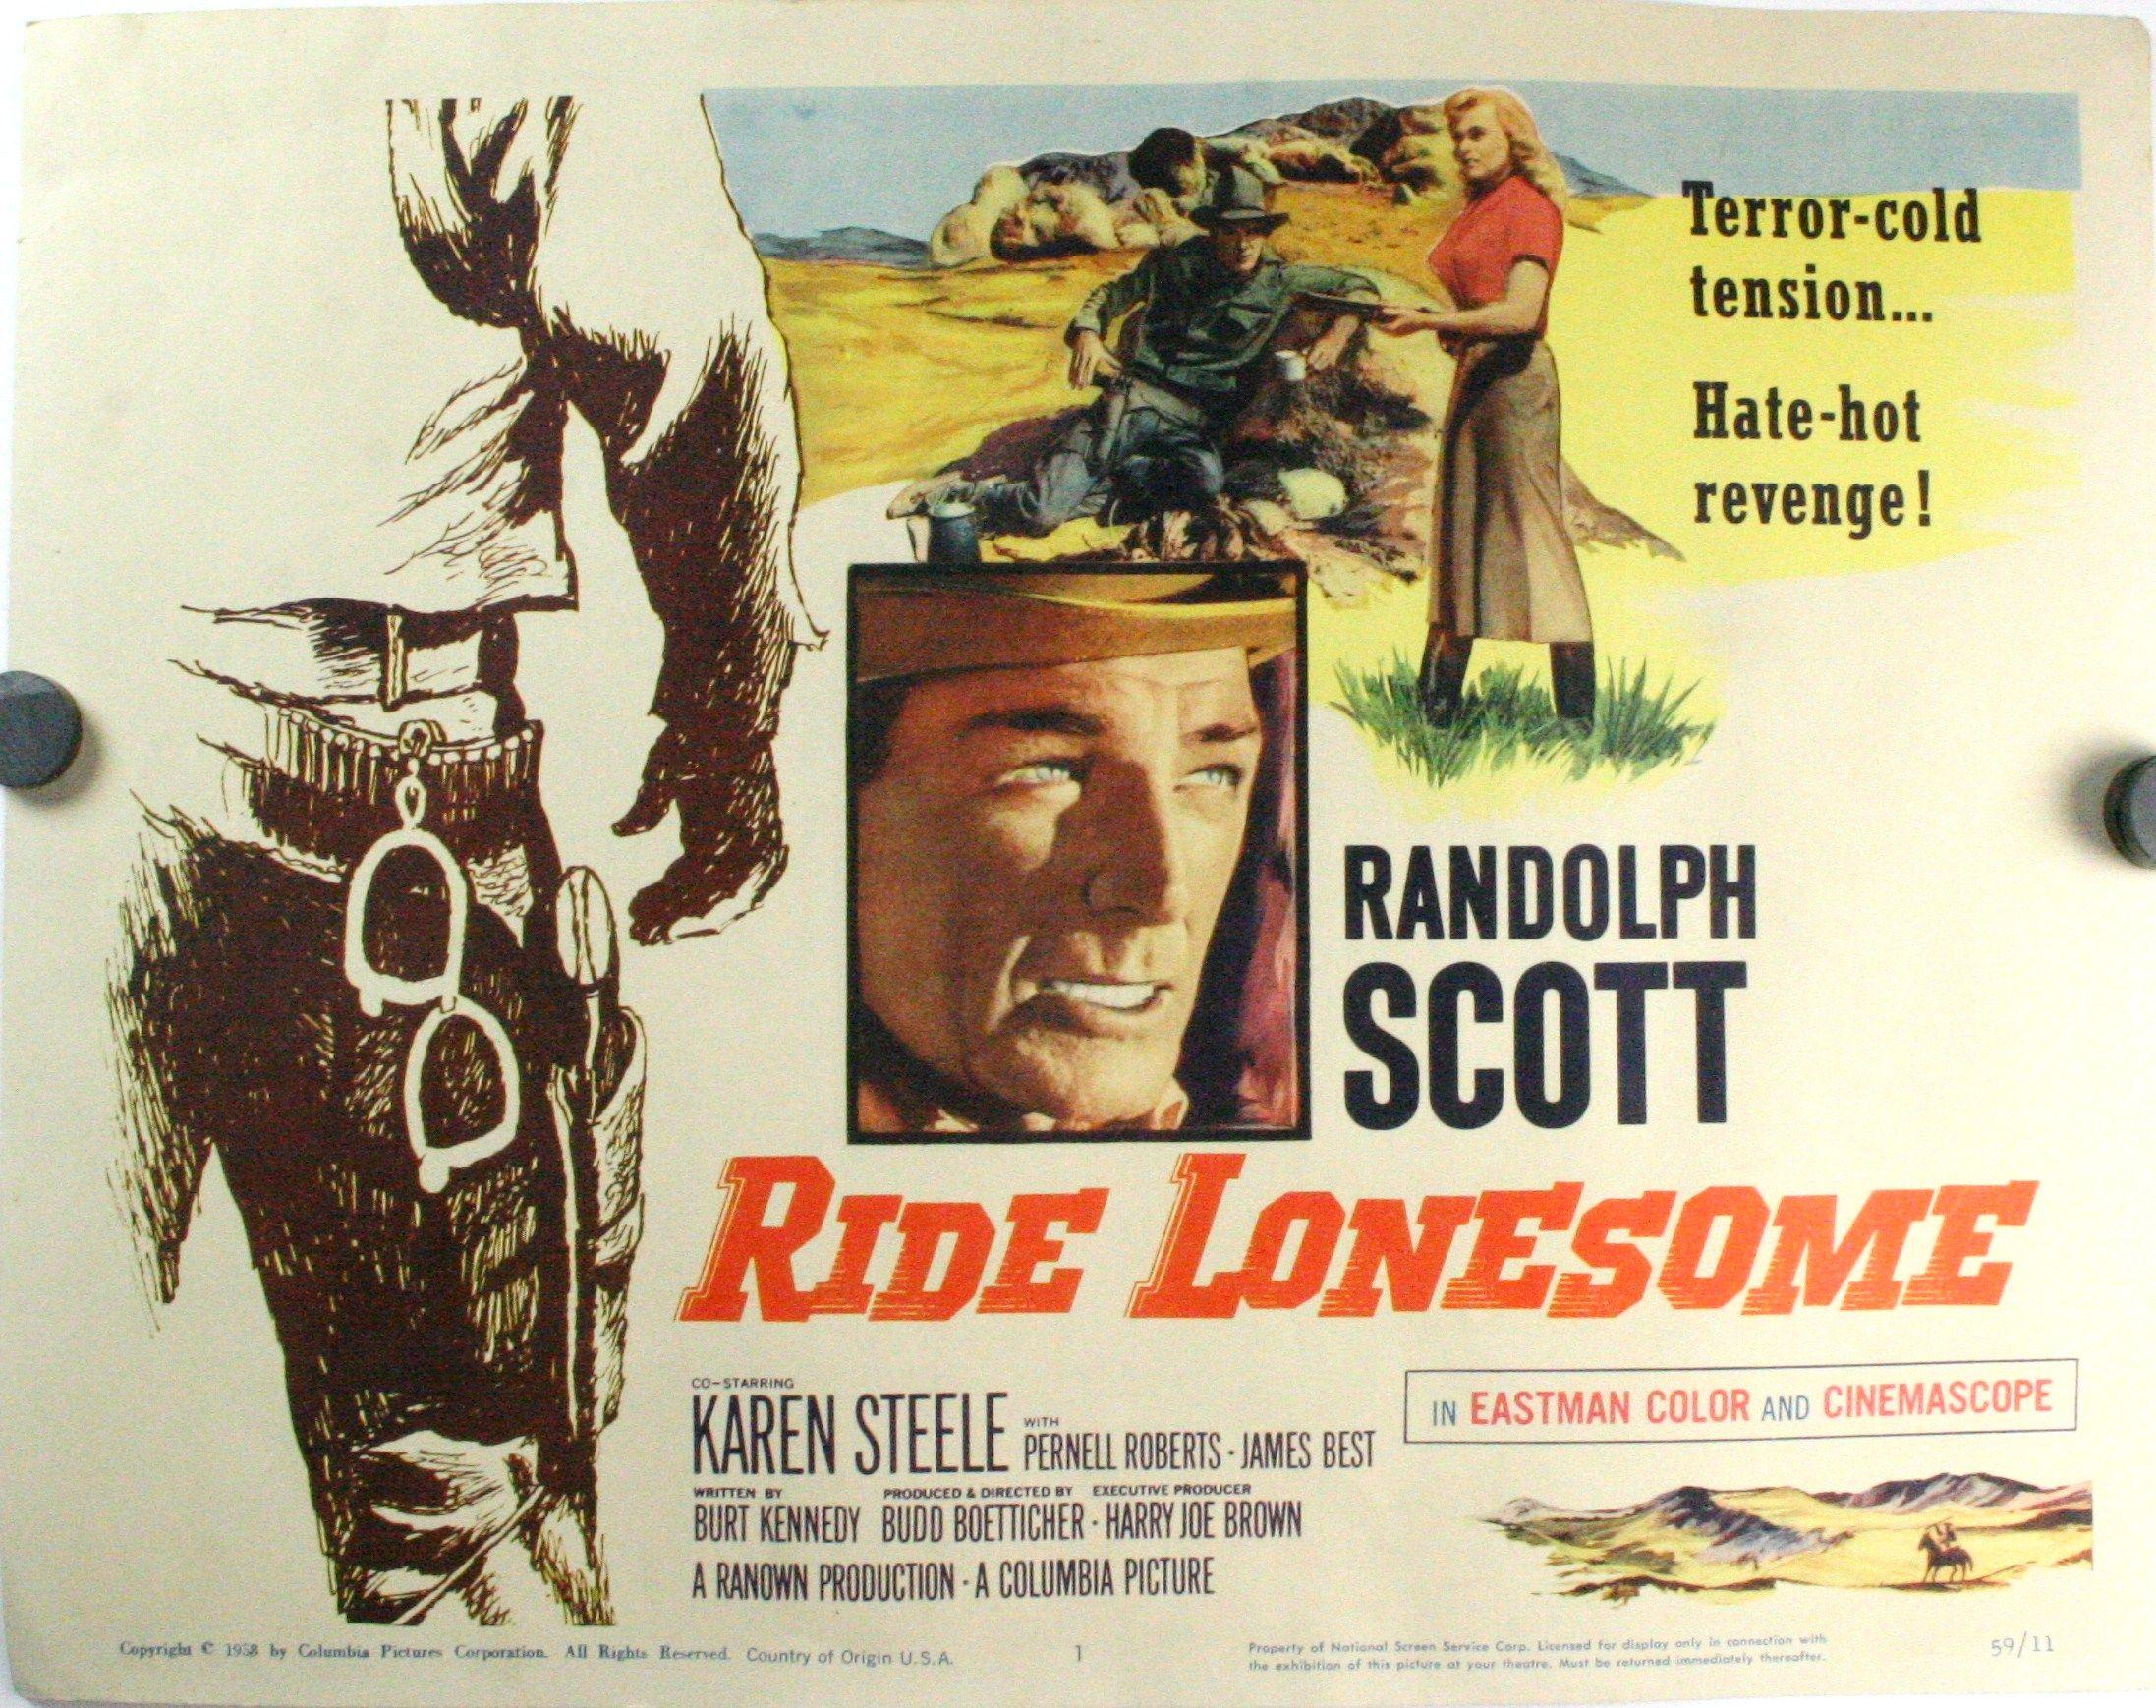 RIDE LONESOME STARRING RANDOLPH SCOTT, Set of 8 Lobby Cards ...